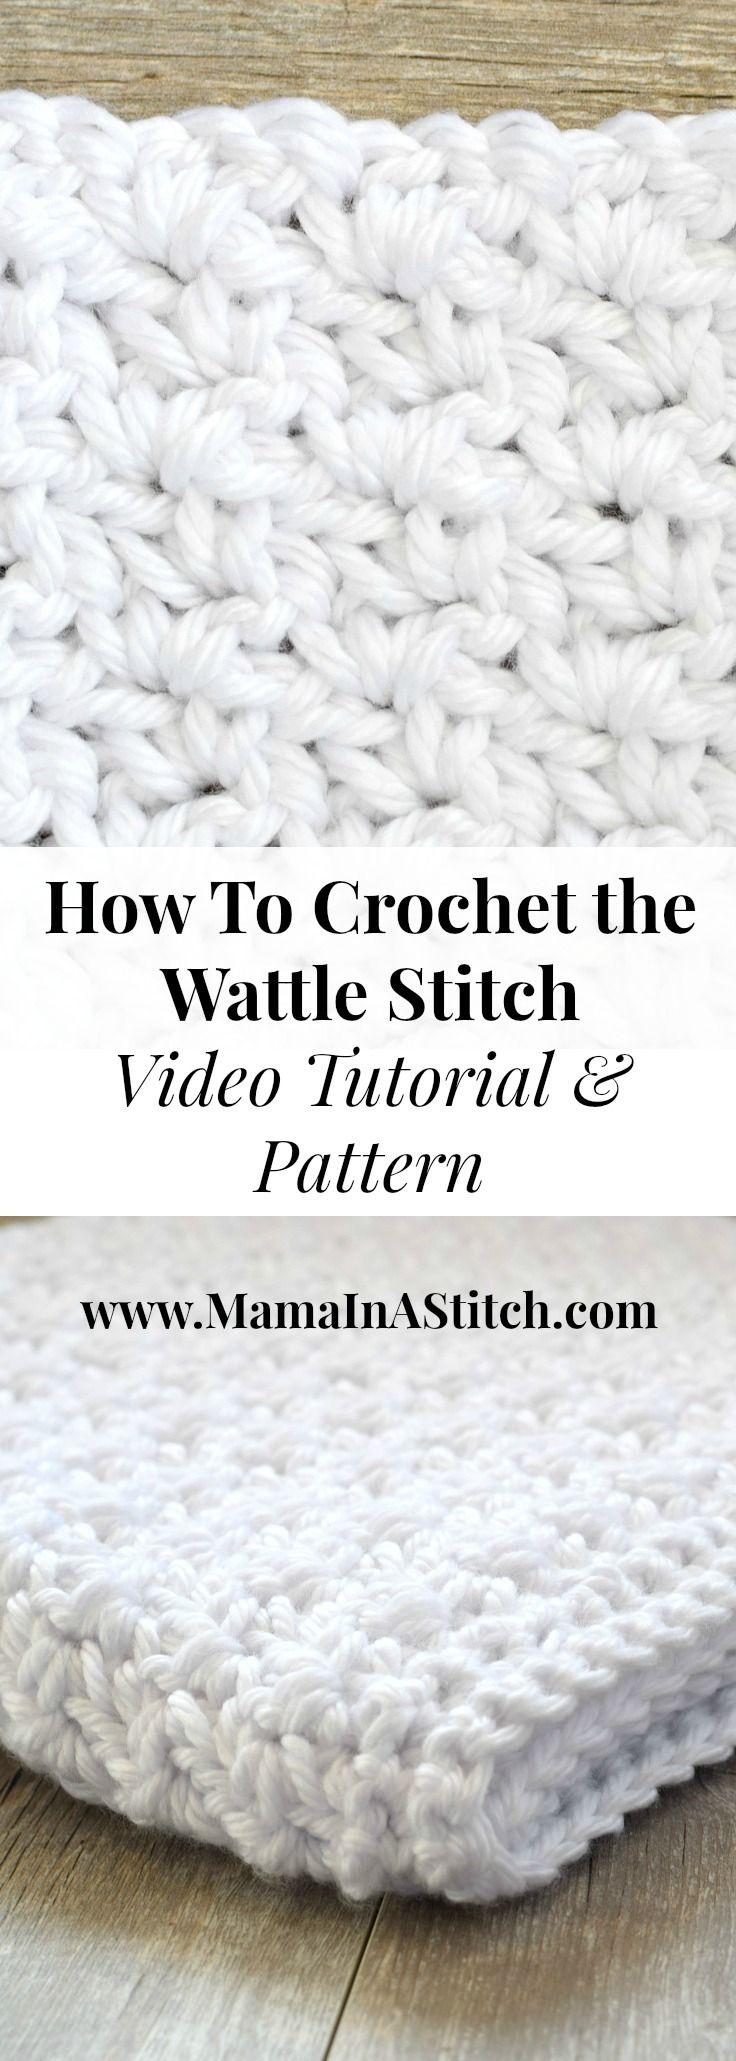 how-to-crochet-tutorial-wattle-stitch | Puntadas | Pinterest ...